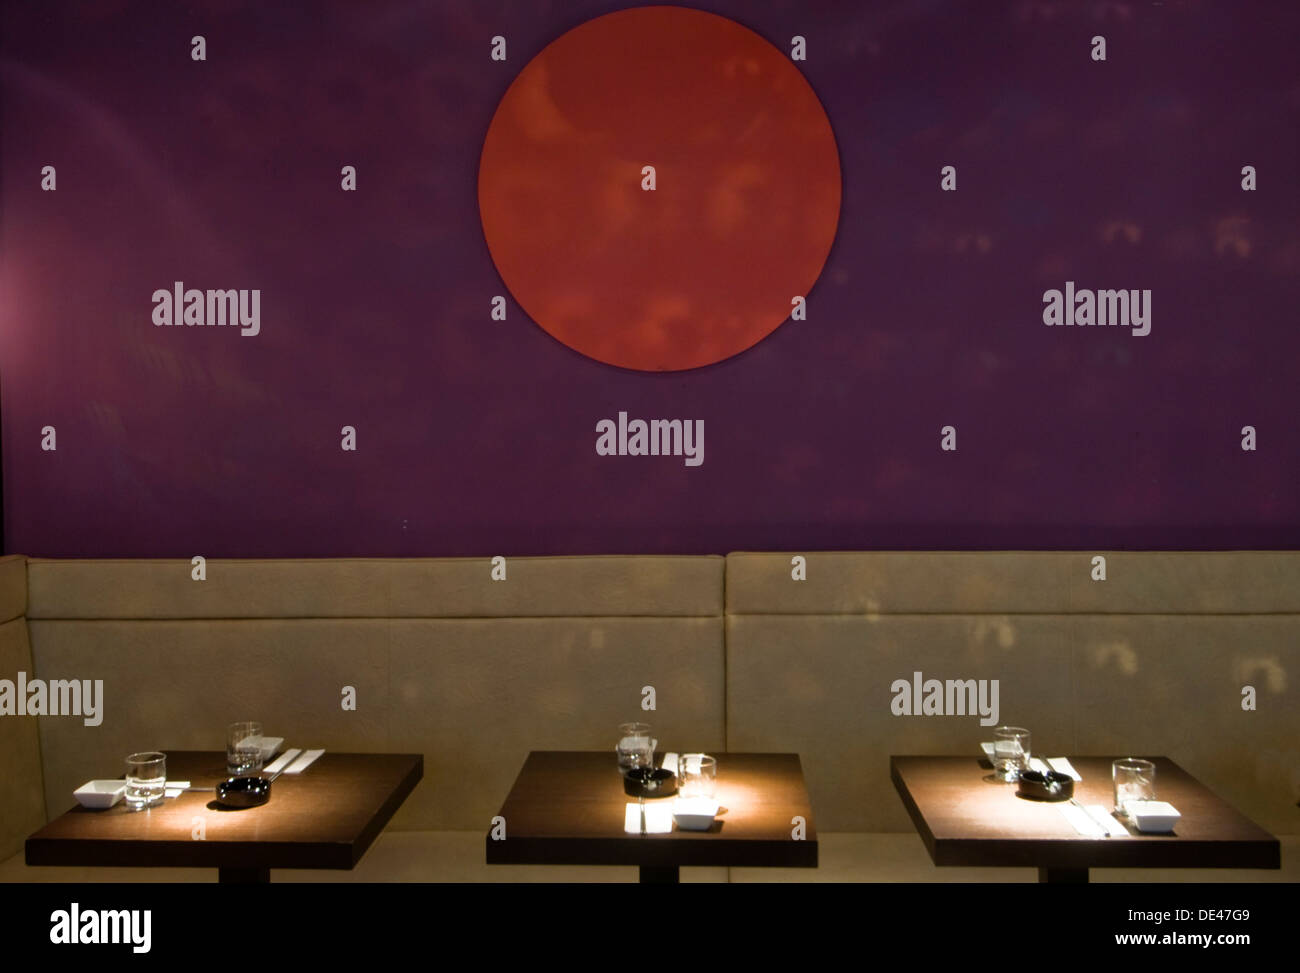 Österreich, Wien 6, Mariahilfer Straße 103, Dots - Experimental Sushi - Stock Image